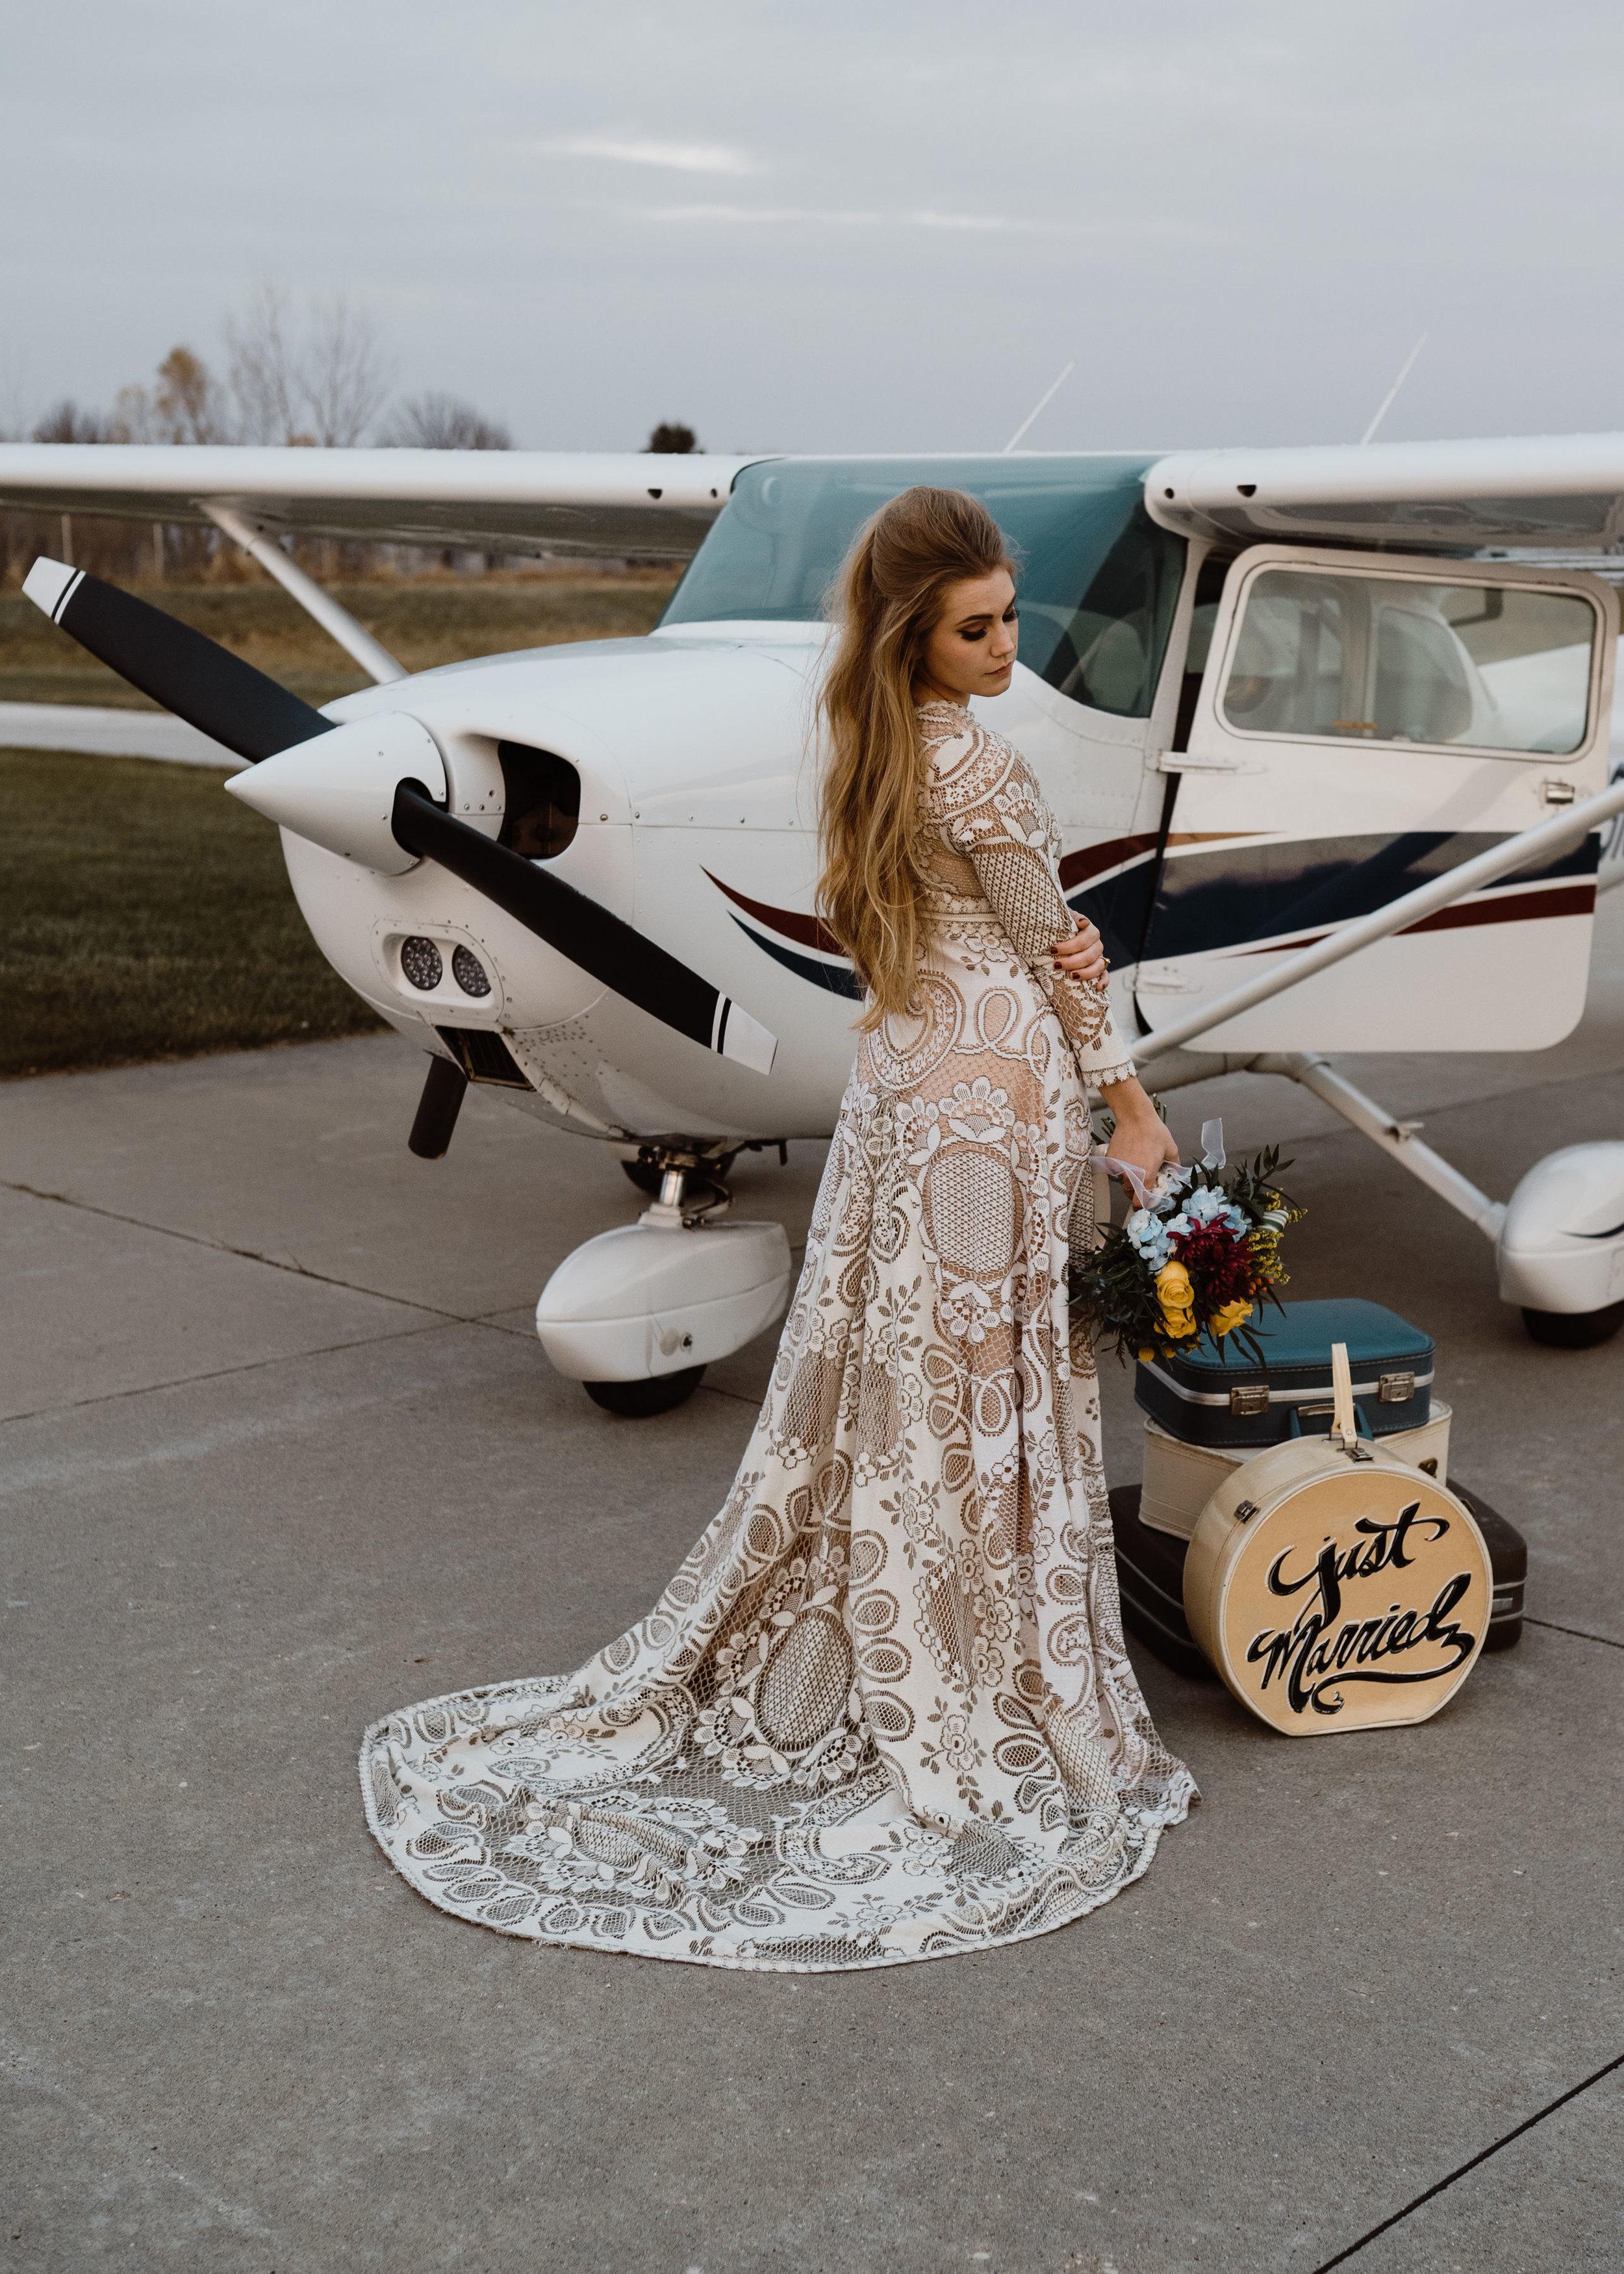 airport-wedding-elopement-ankeny-iowa-09.jpg